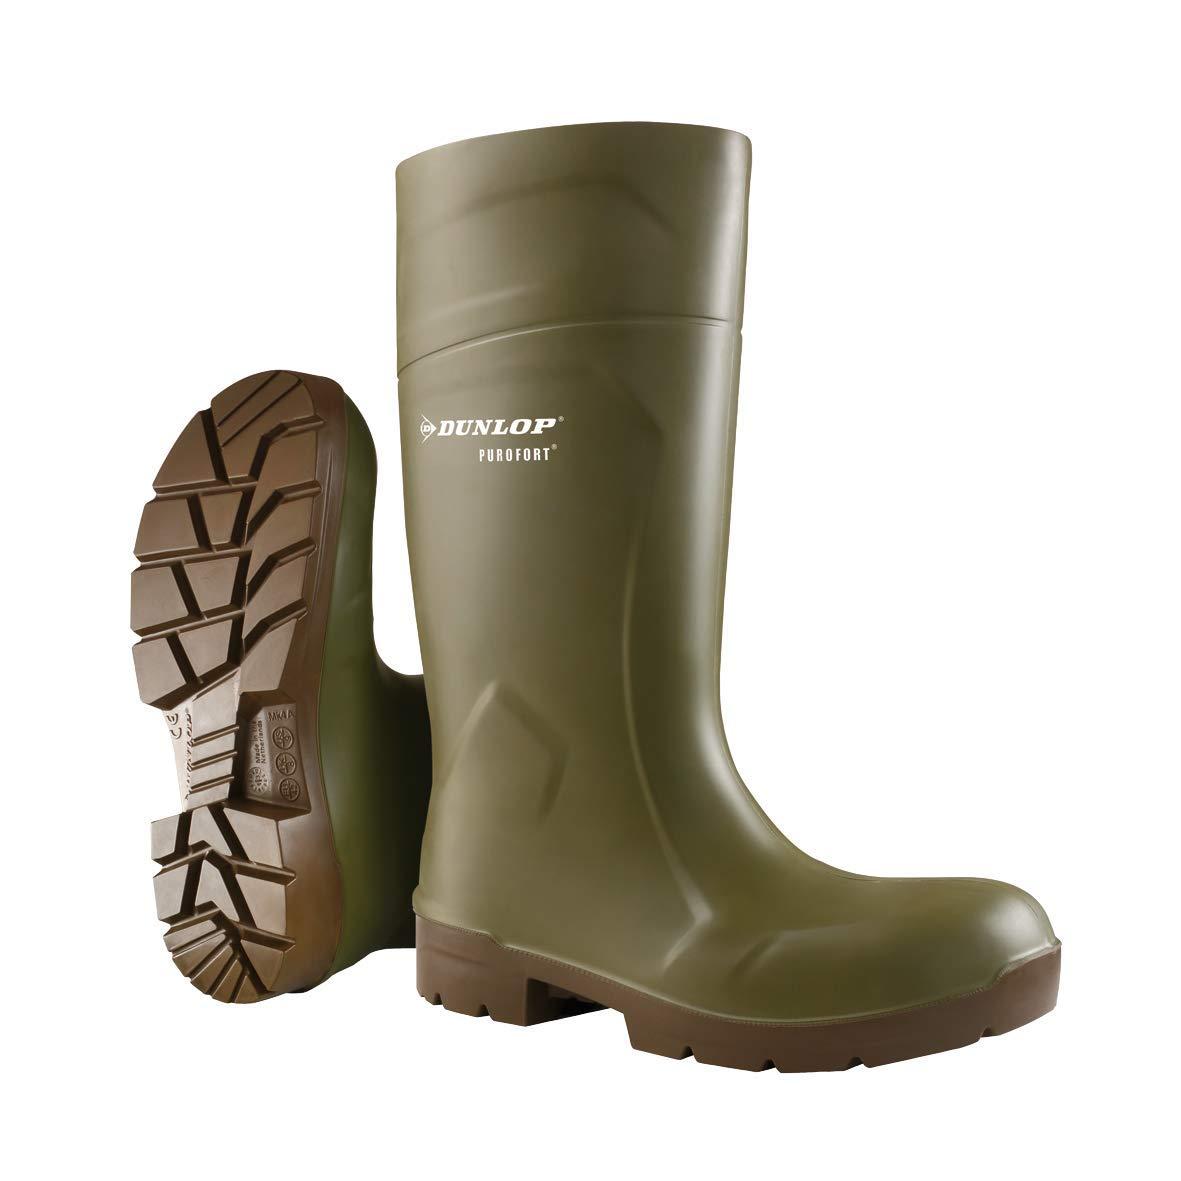 Dunlop FoodPro Purofort MultiGrip Safety Shoes EA51831 Size - 8